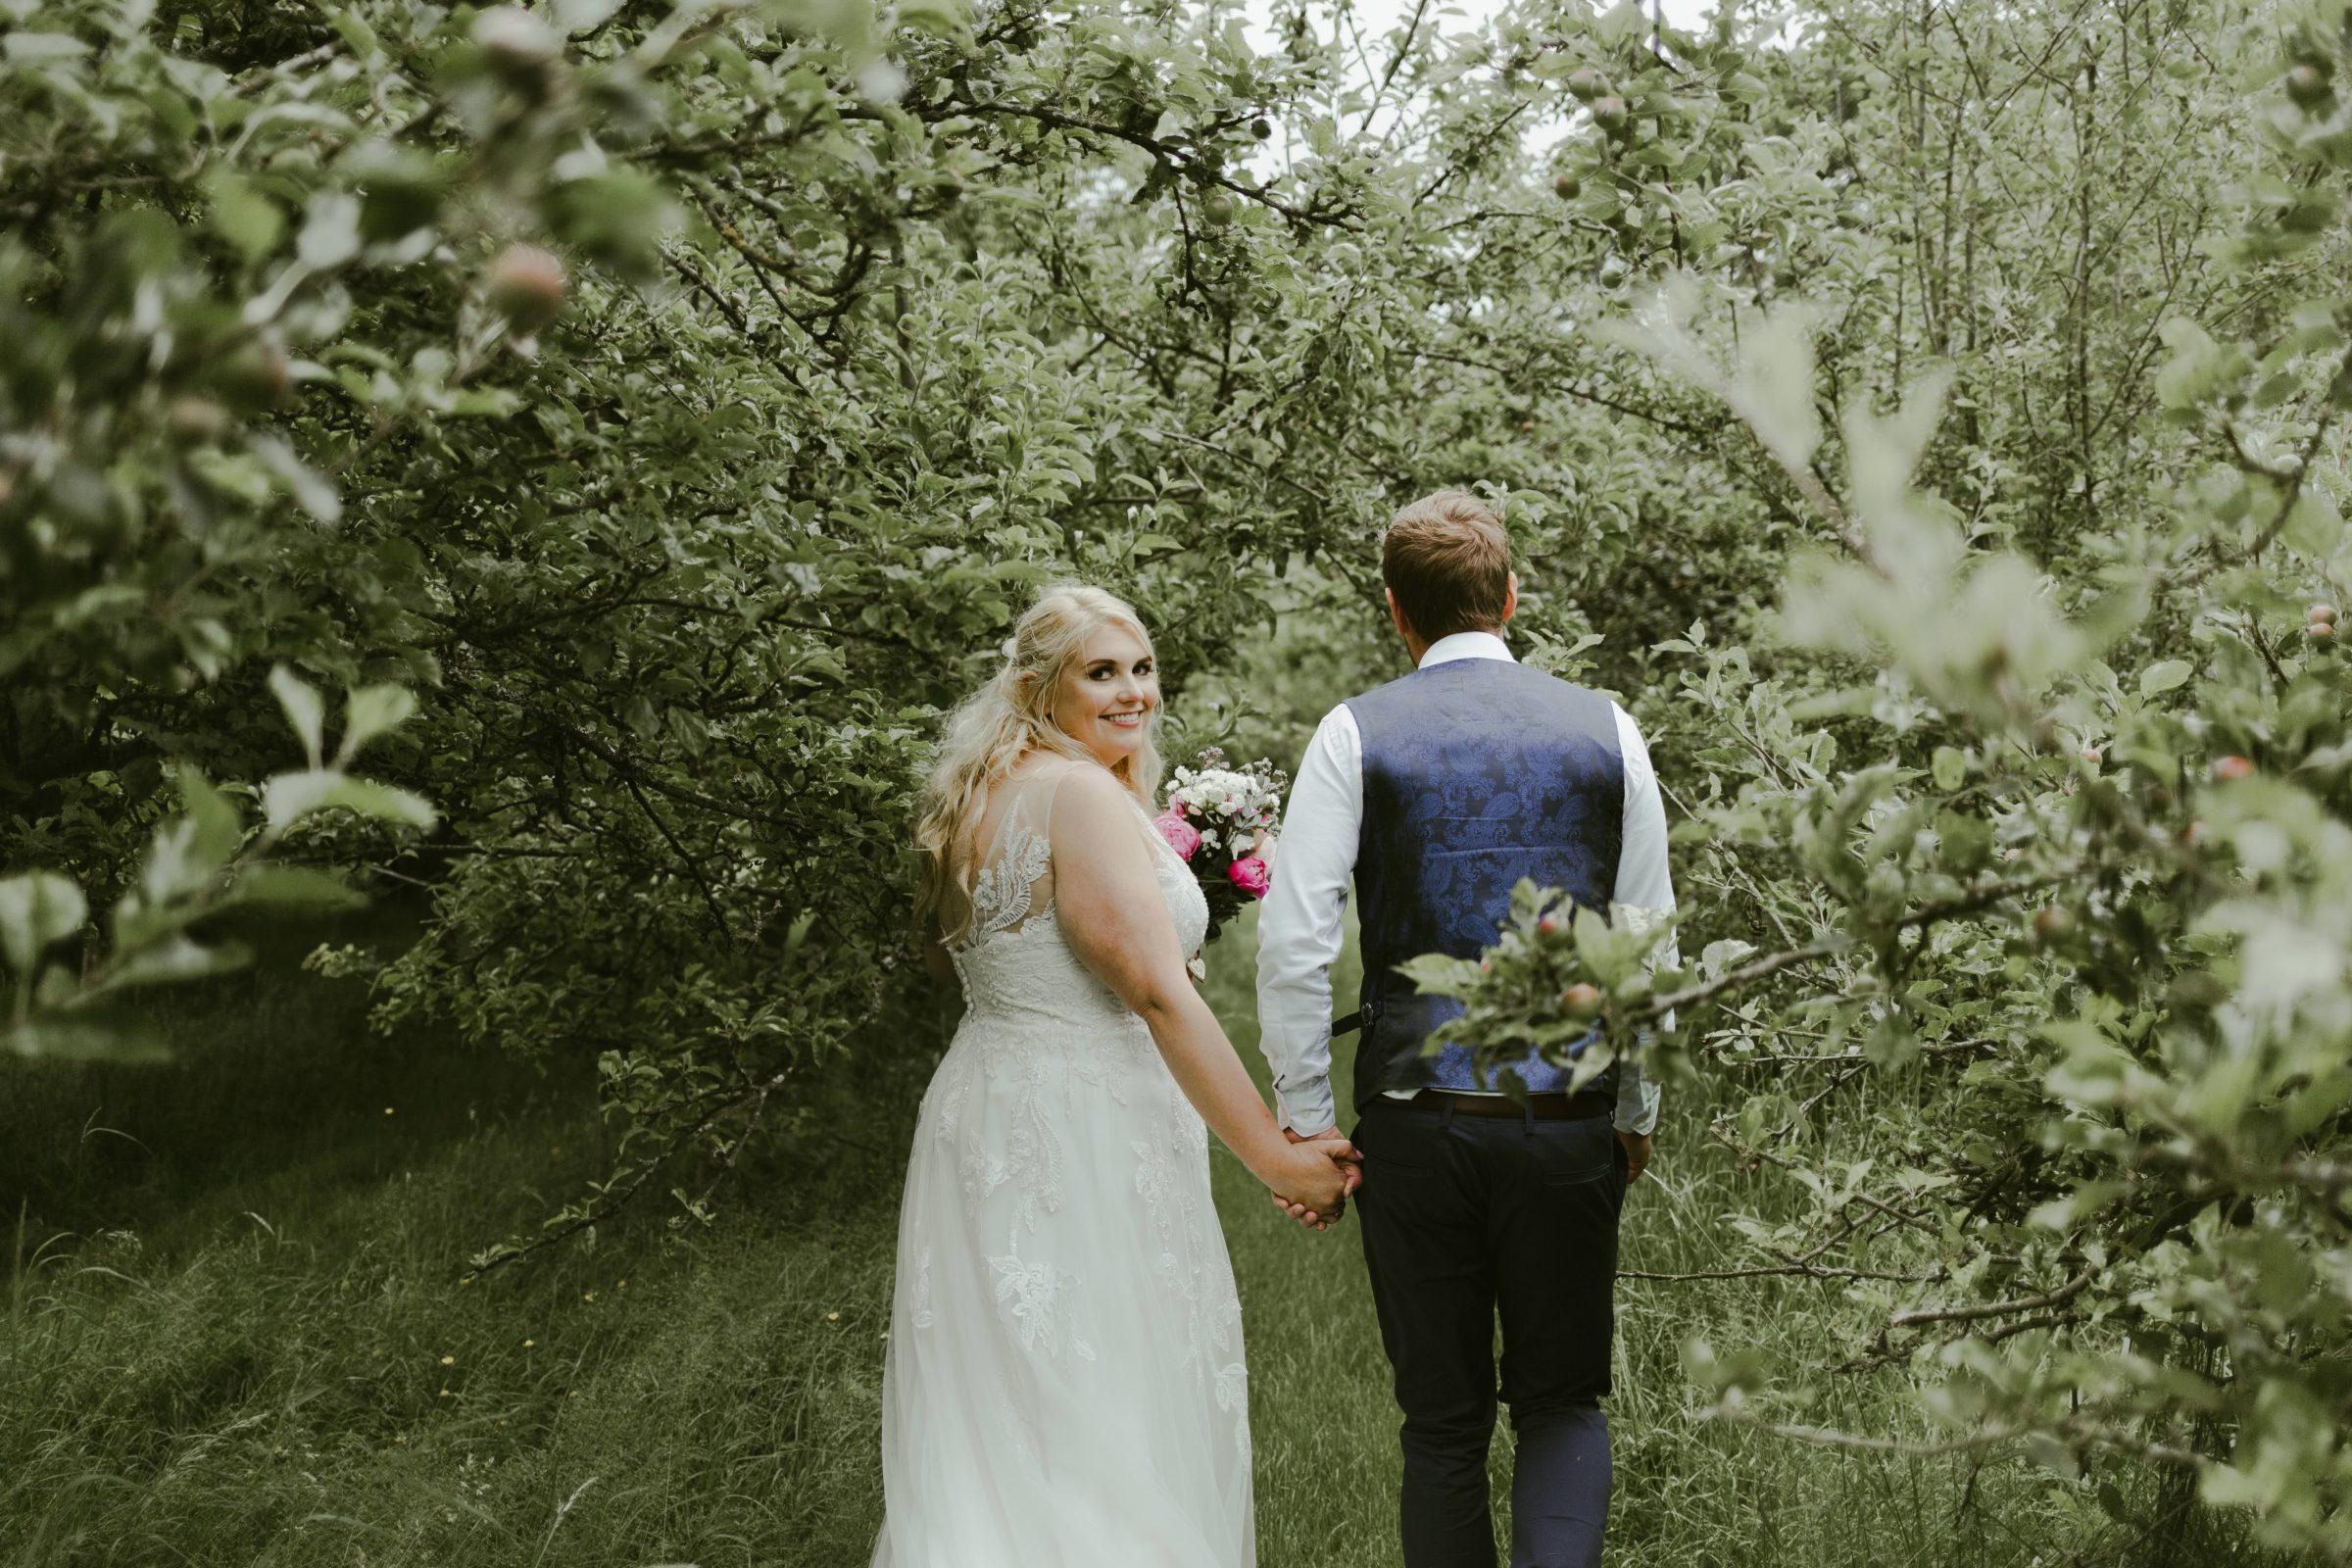 garden-english-wedding-marquee-photographer-uk-surrey-DIY-photography